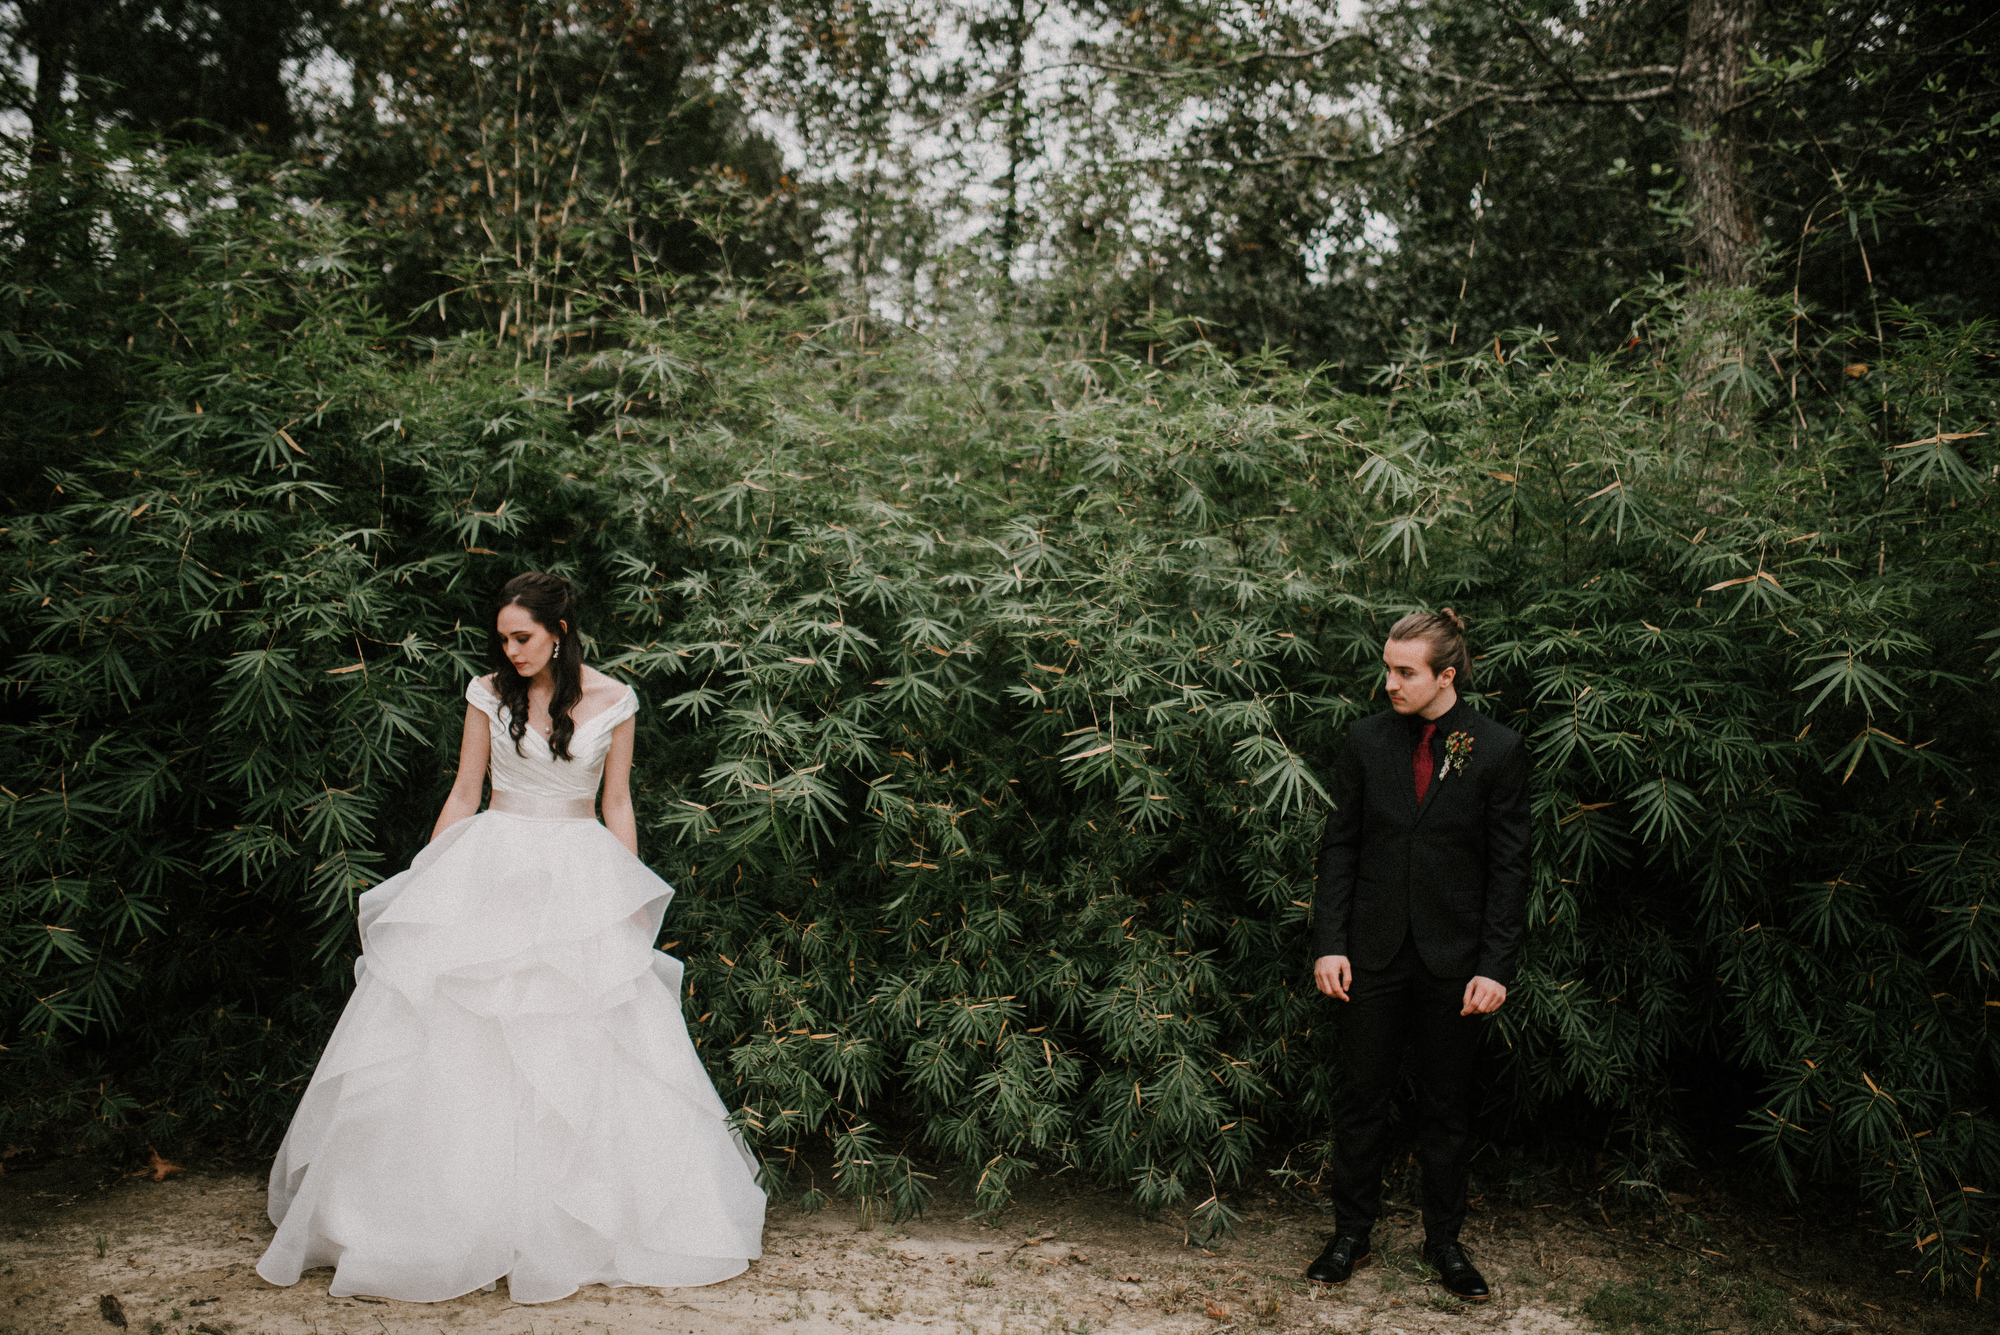 ofRen_weddingPhotos030.JPG